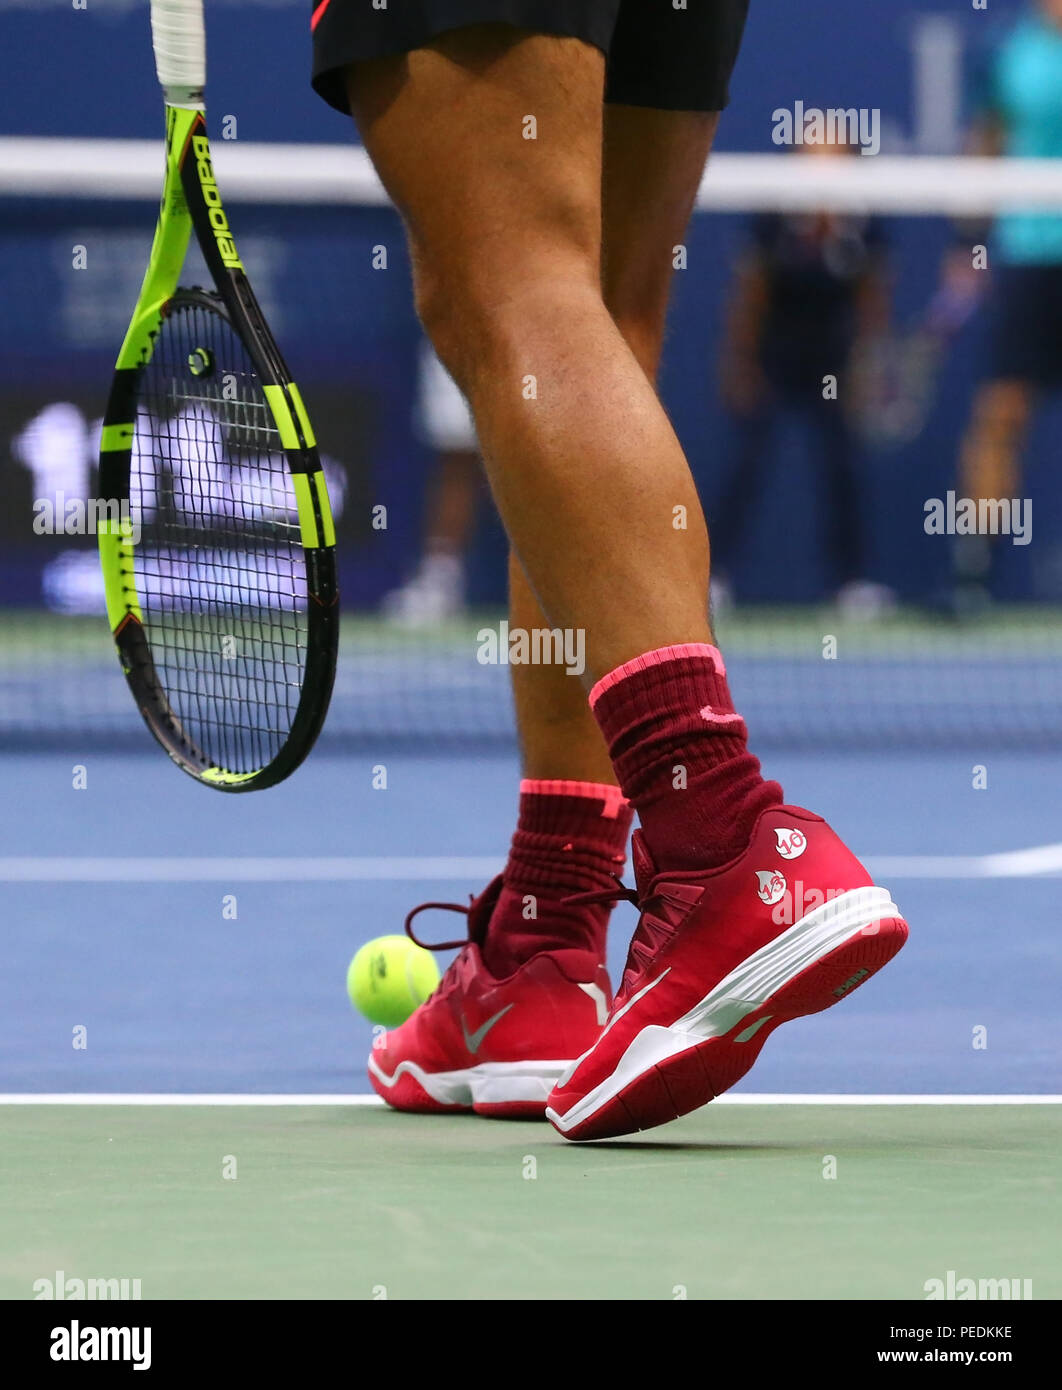 Stockamp; Alamy De Imágenes Nike Tennis Fotos Qhrdts